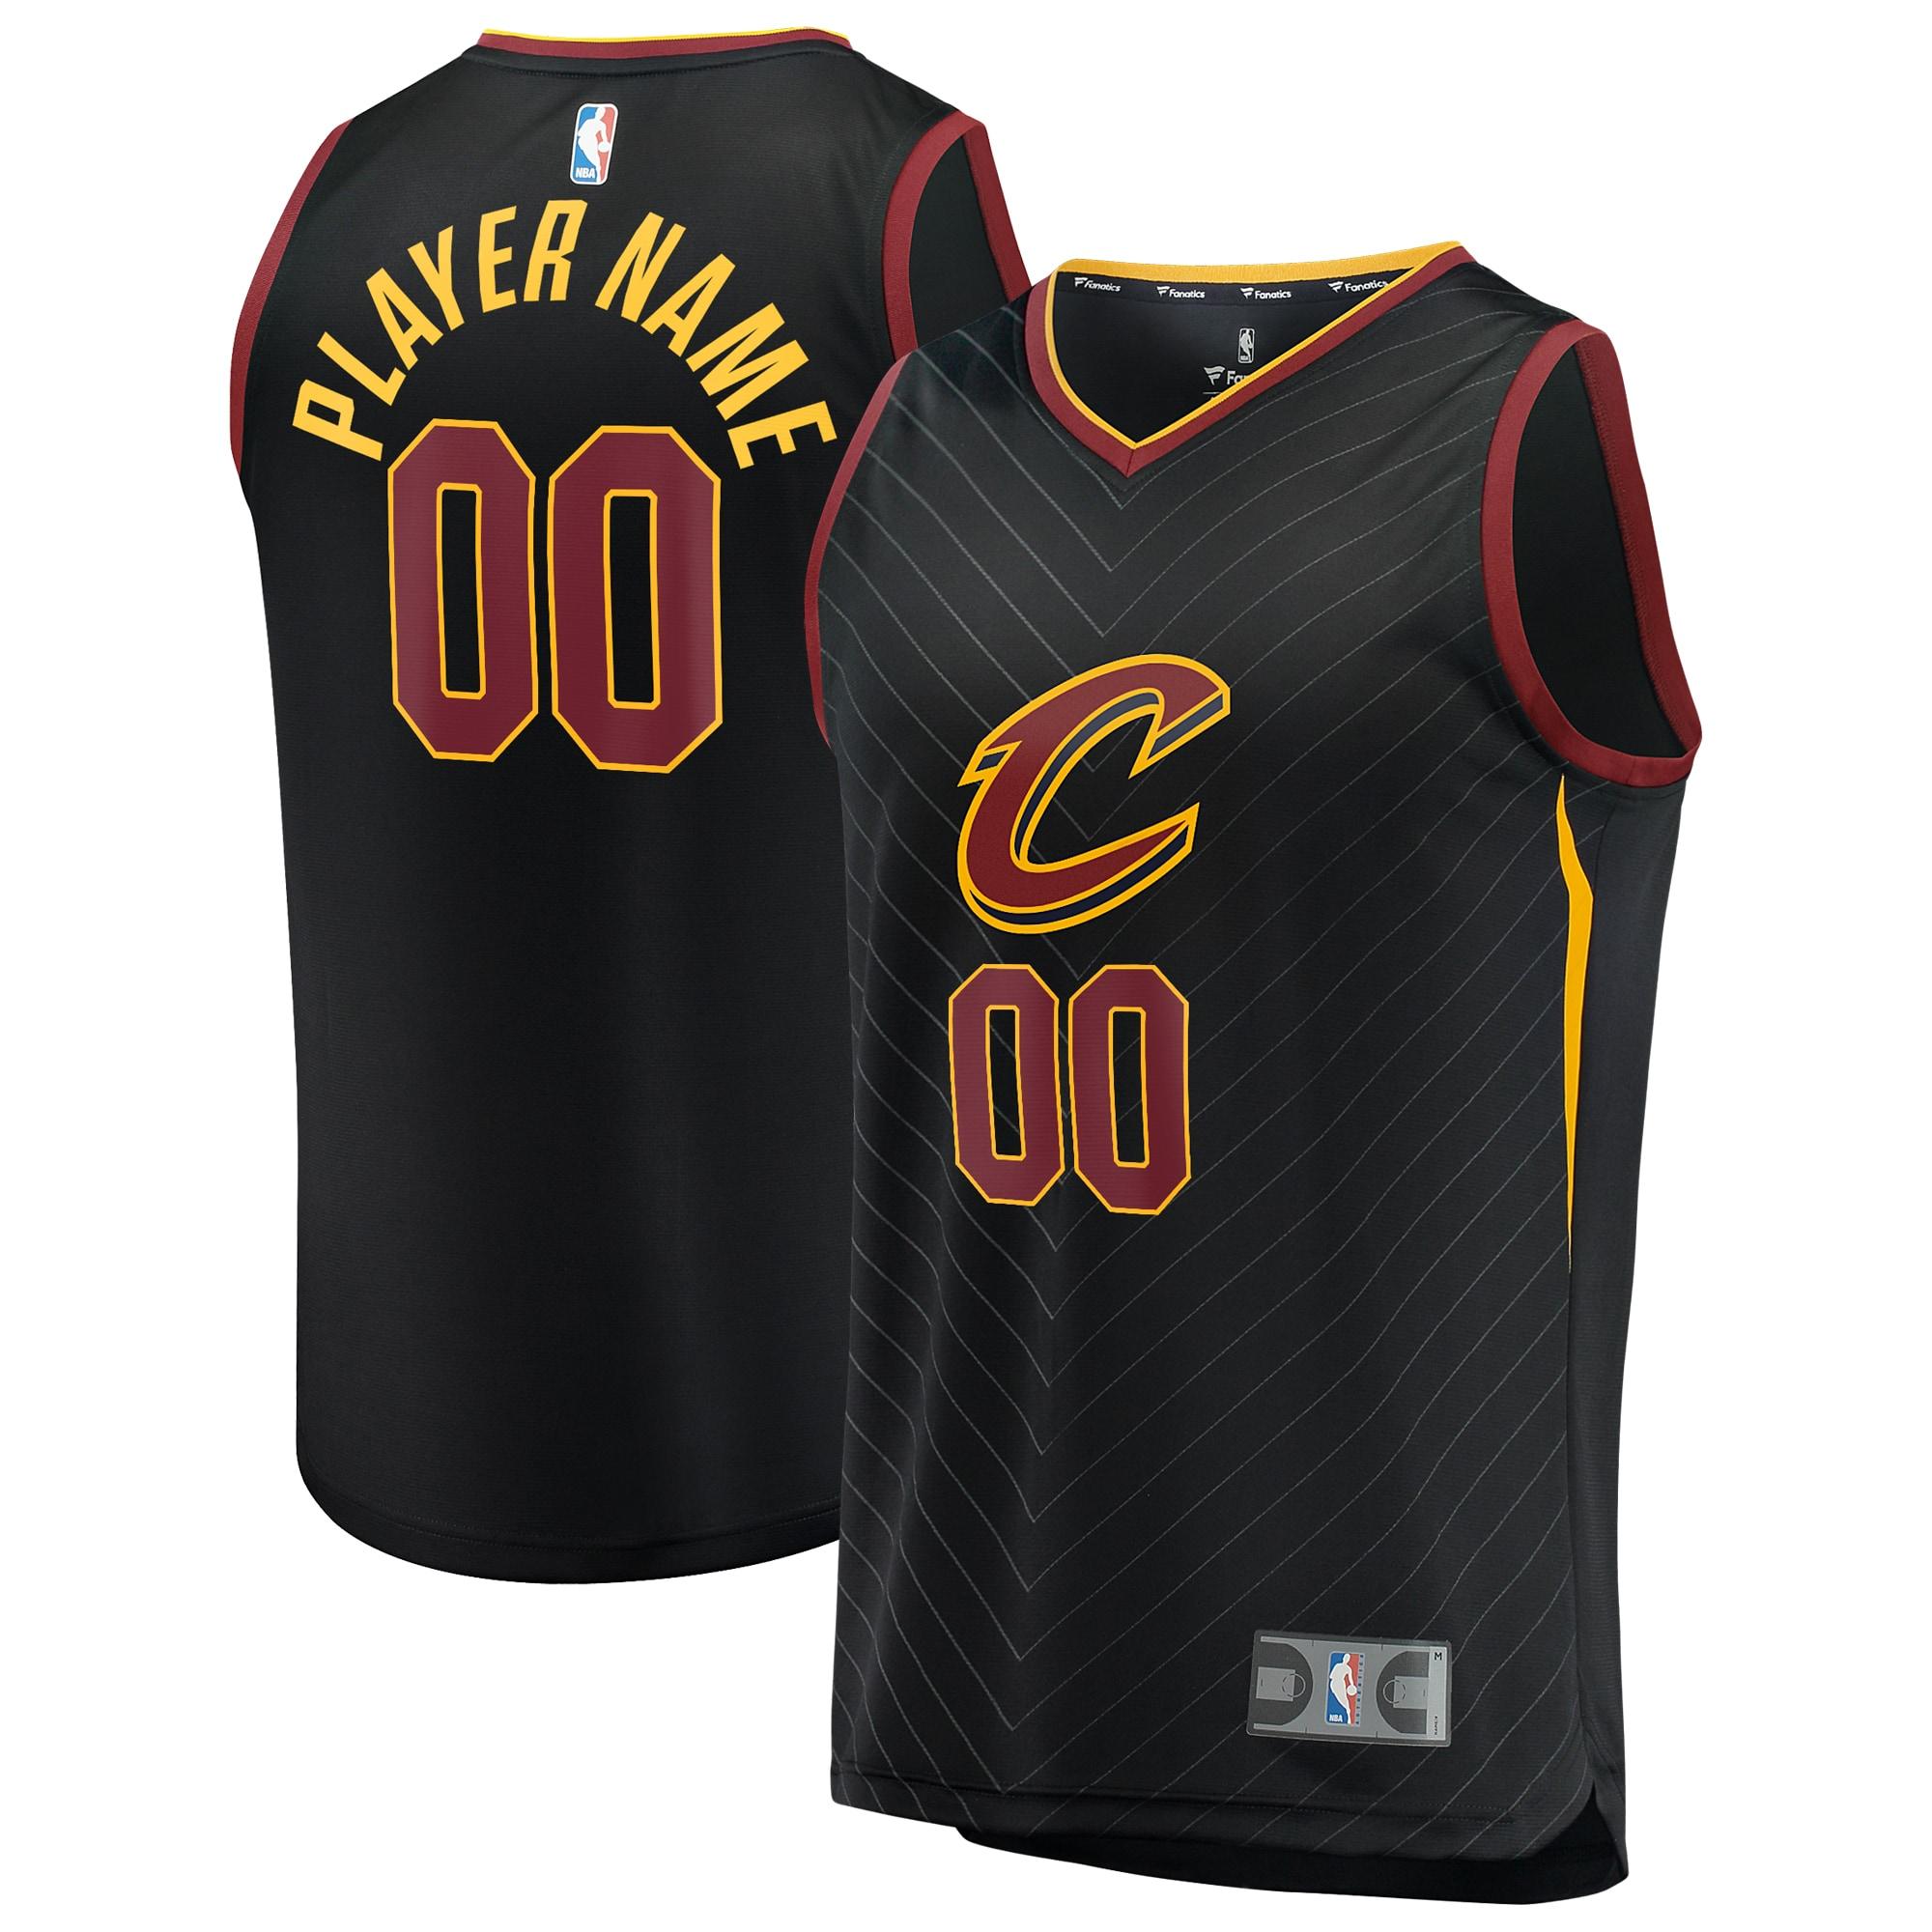 Cleveland Cavaliers Fanatics Branded Fast Break Custom Replica Jersey Black - Statement Edition